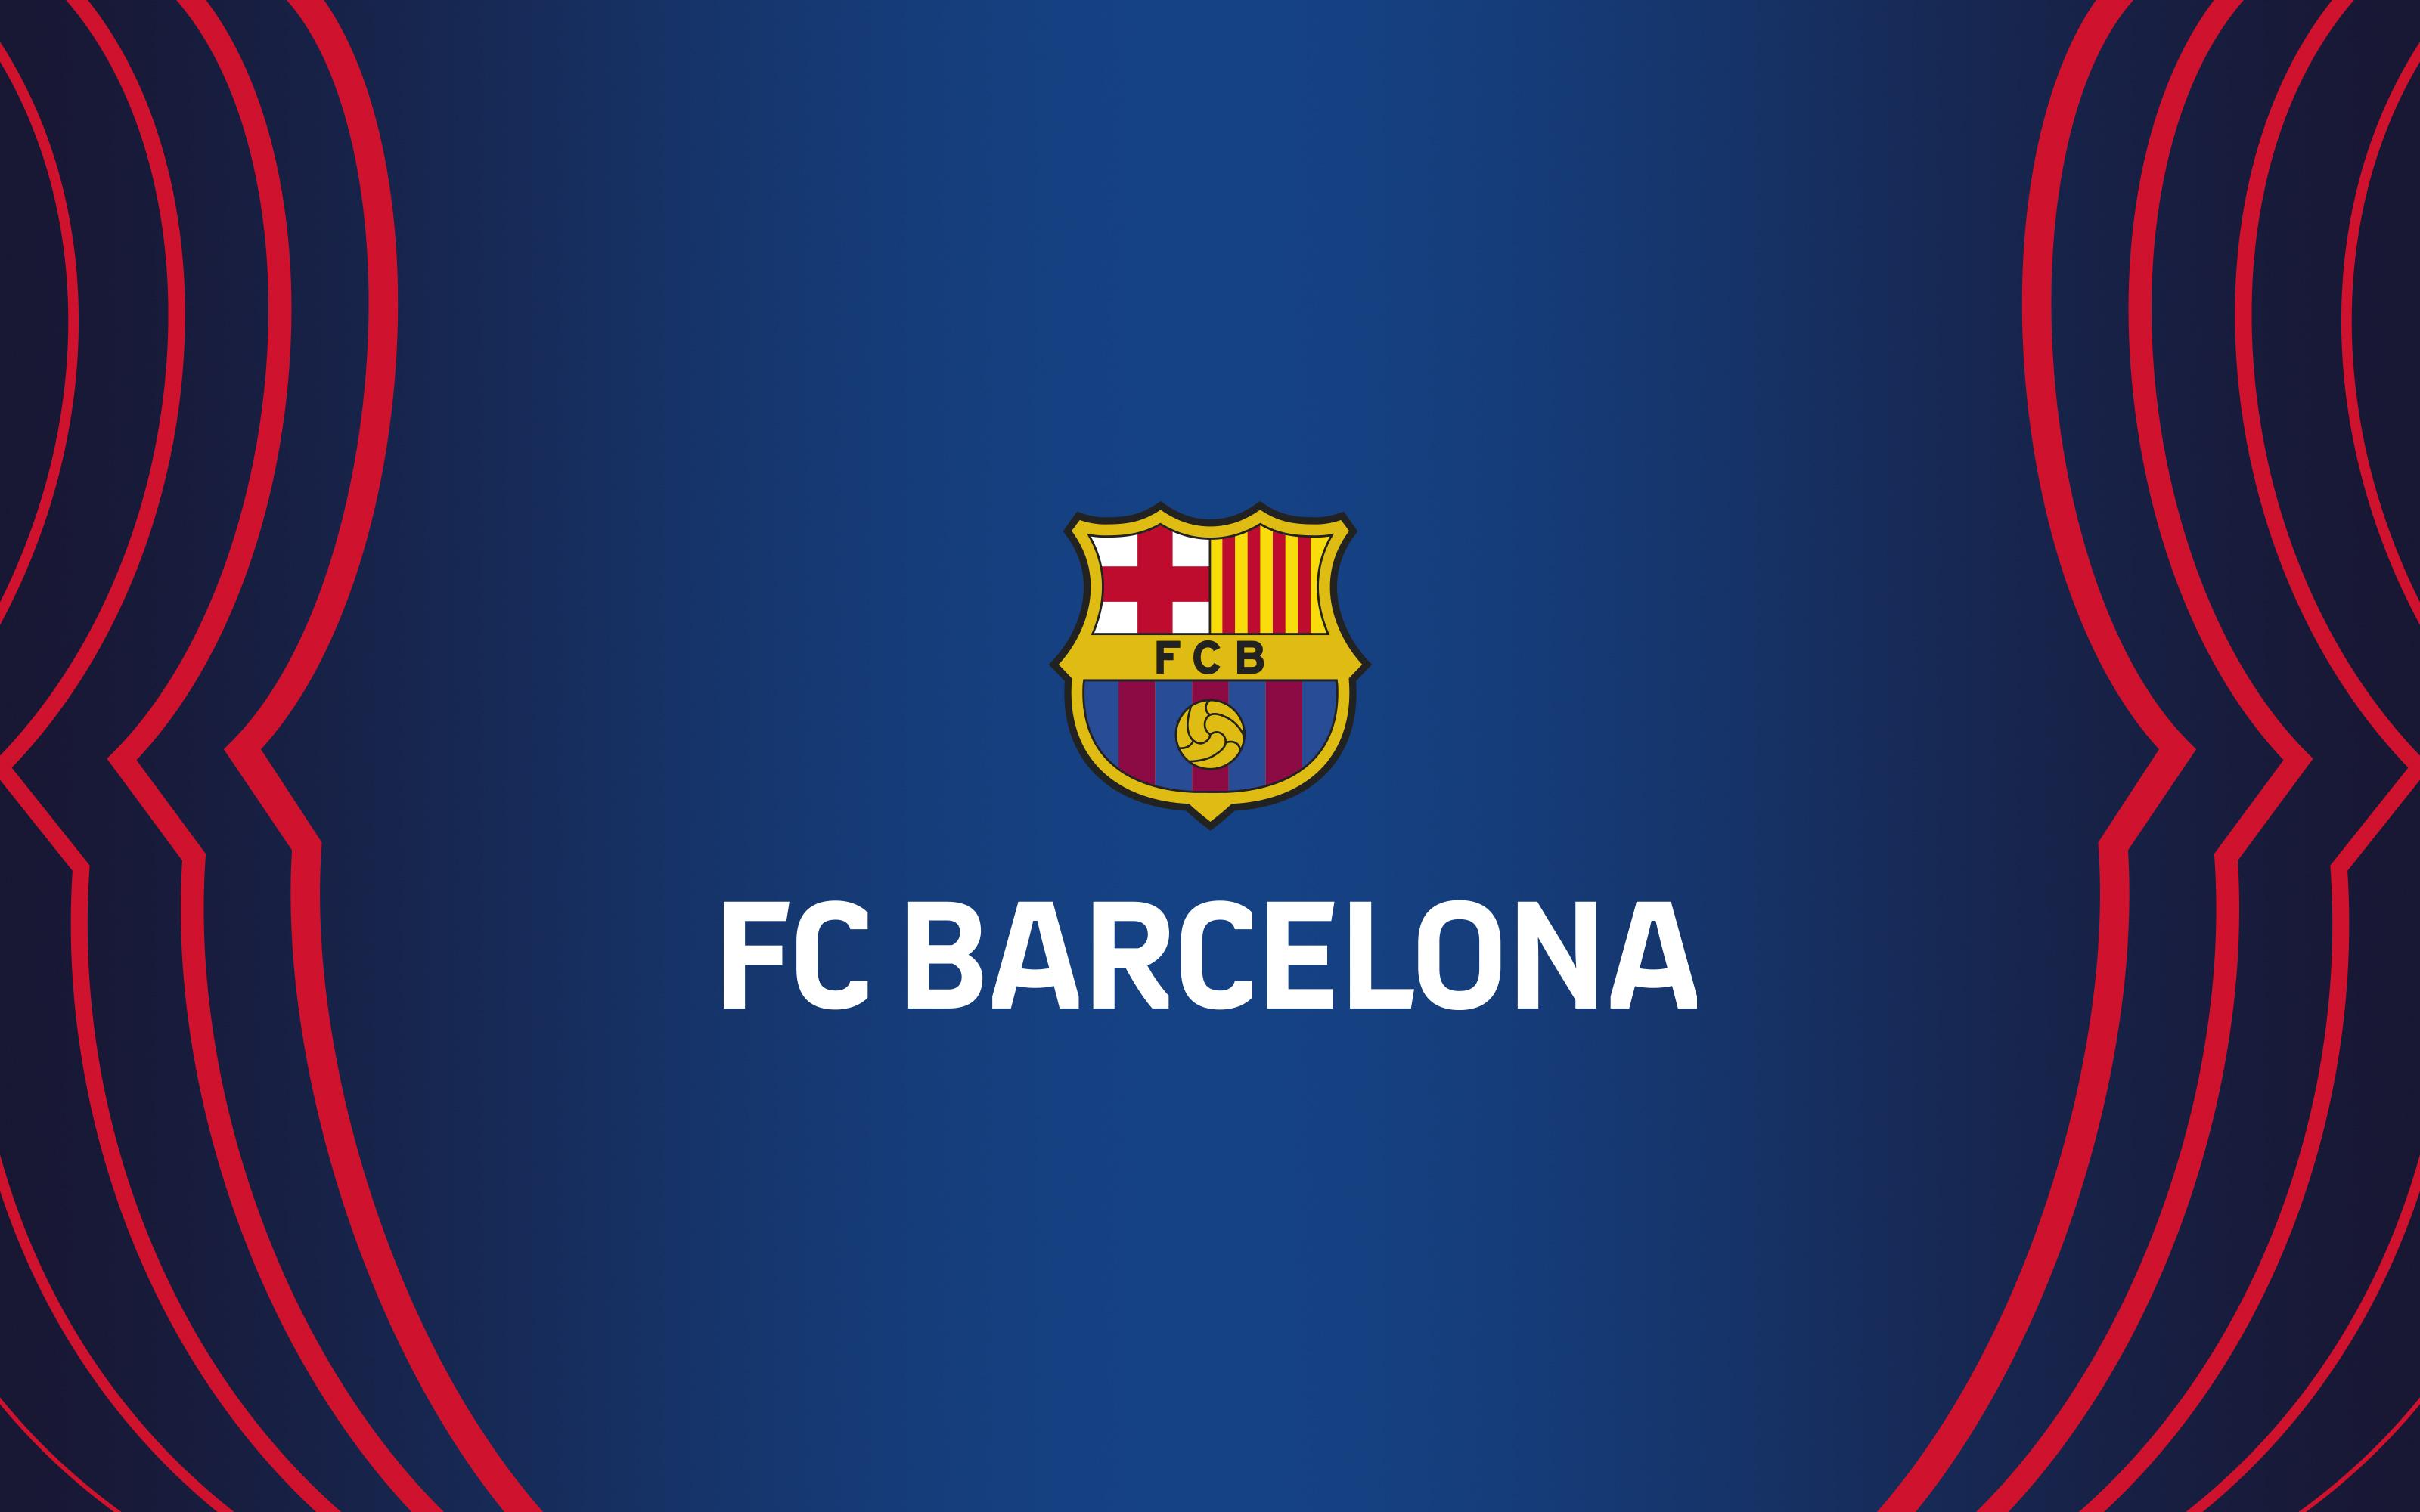 FC Barcelona statement